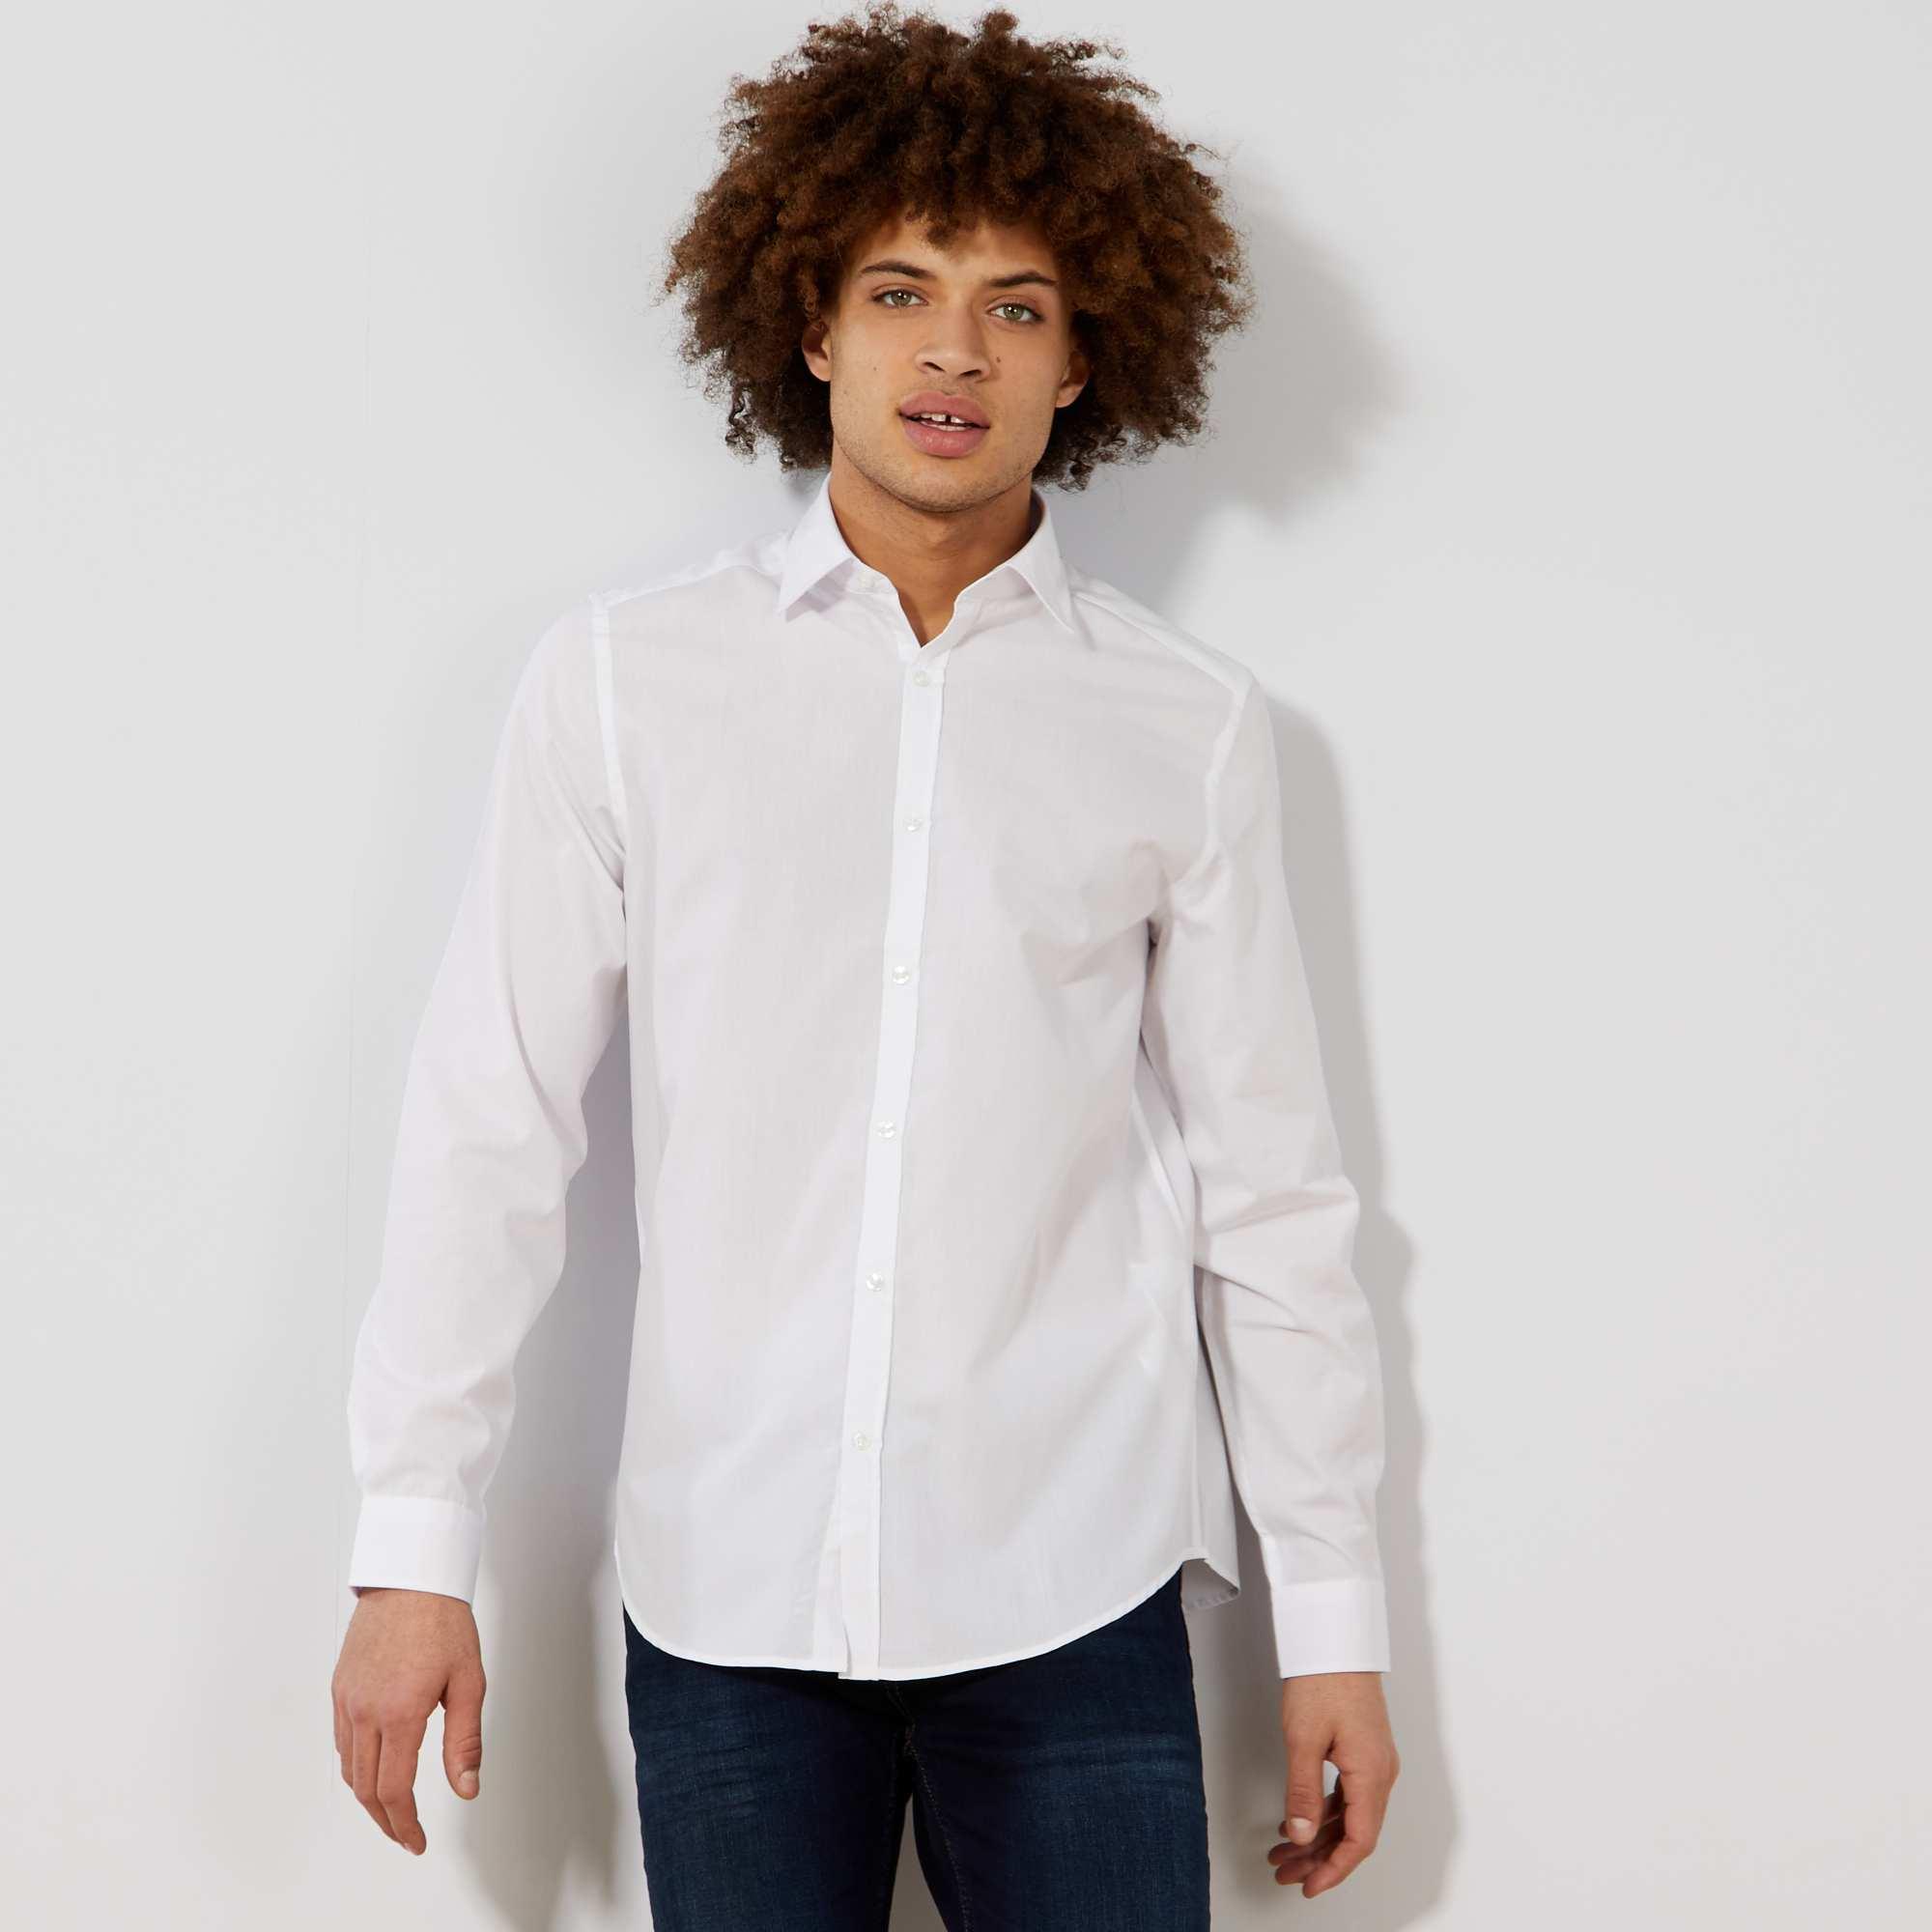 Chemise blanche unie coupe droite homme blanc kiabi - Chemise coupe droite homme ...